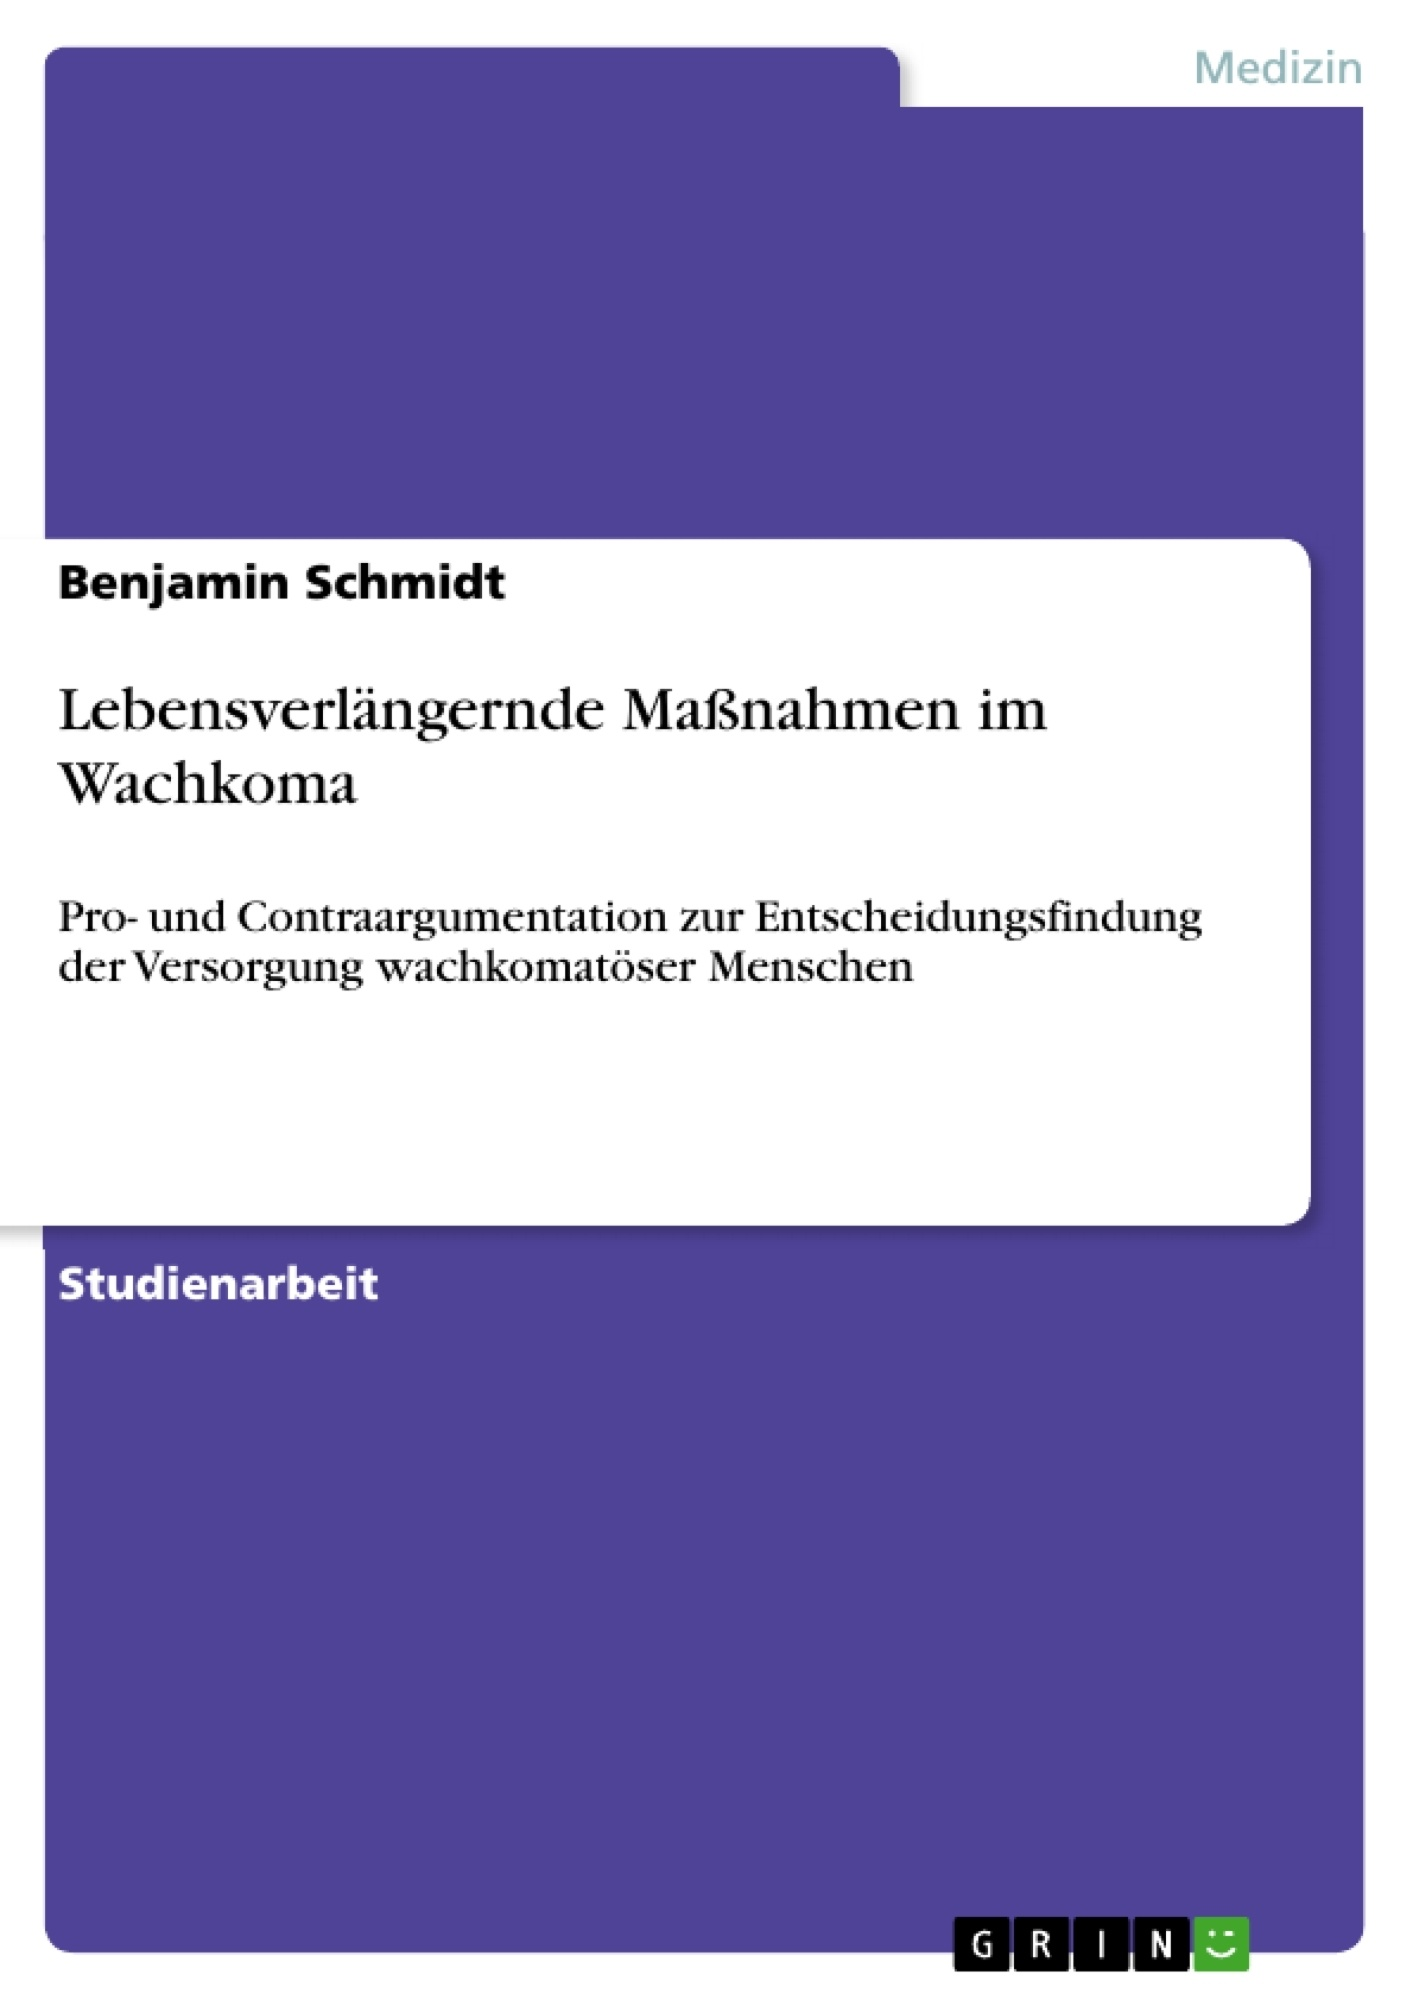 Titel: Lebensverlängernde Maßnahmen im Wachkoma